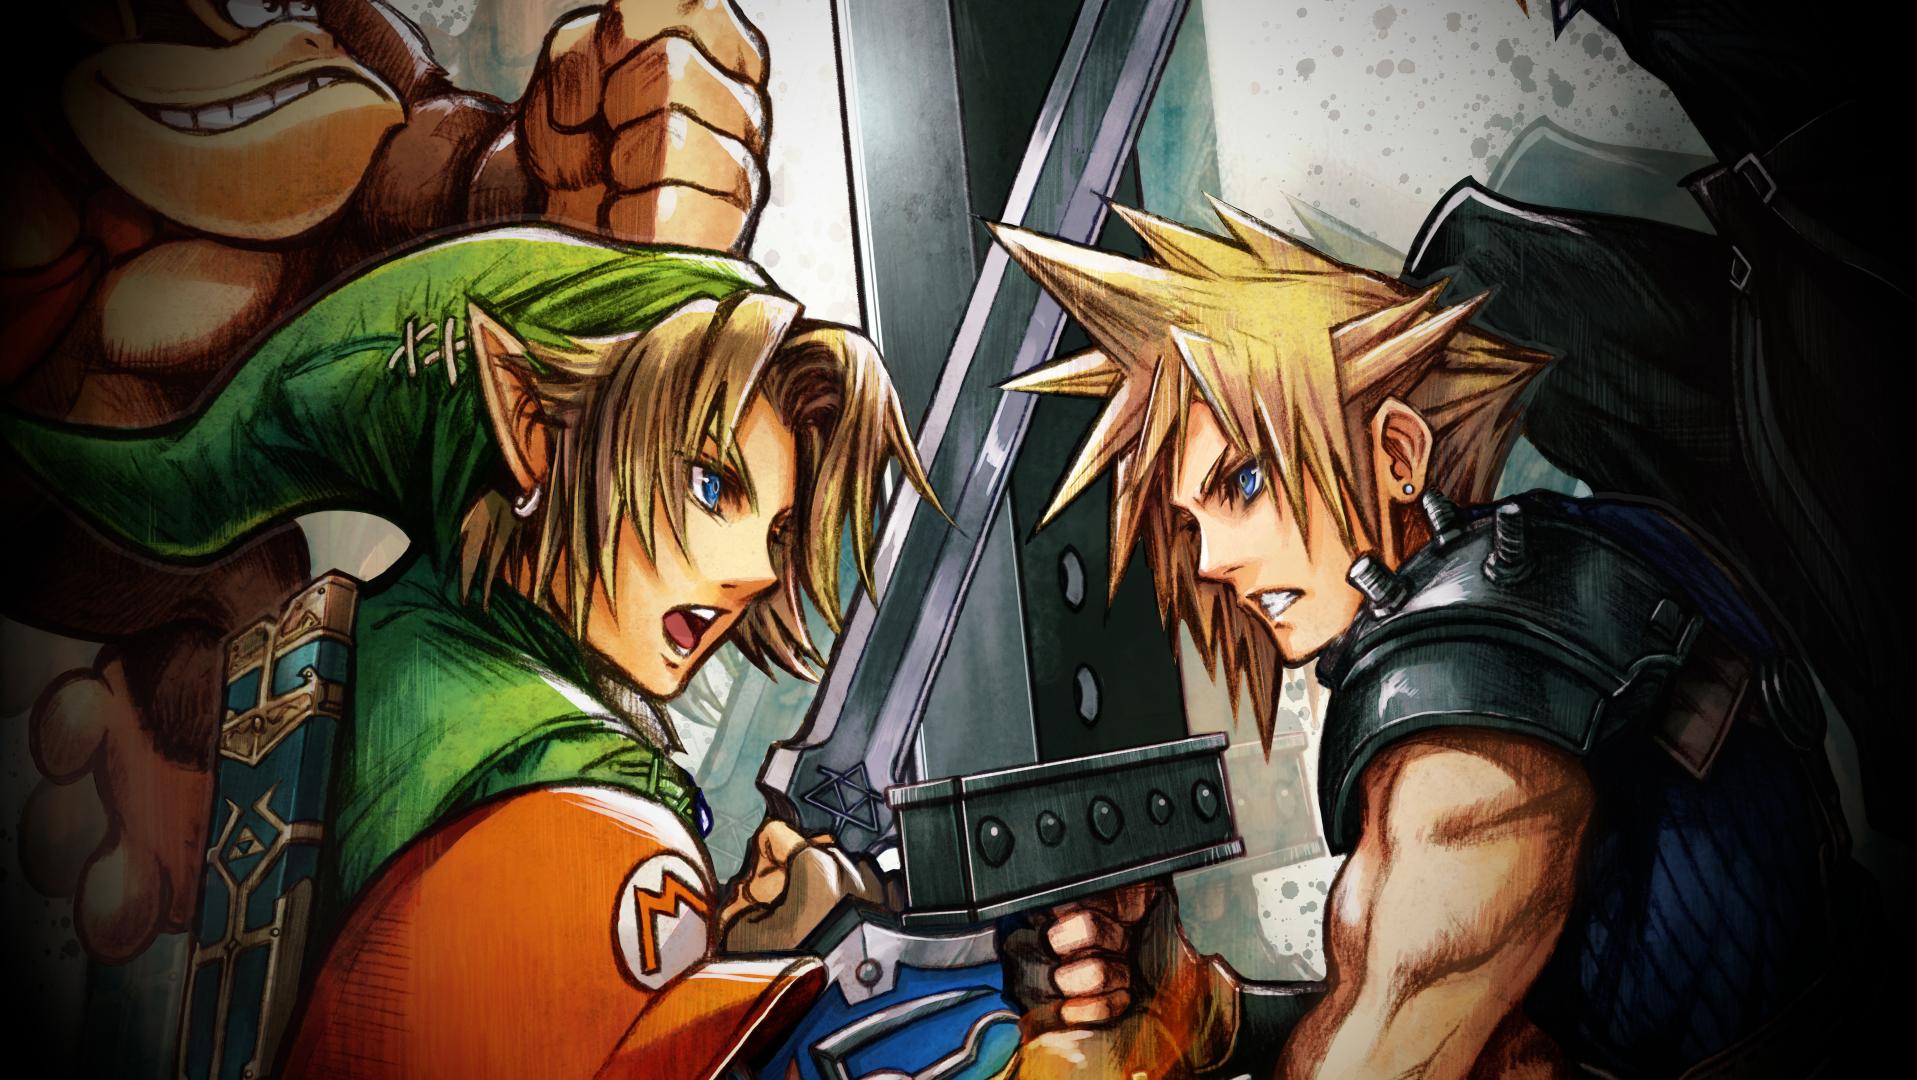 Cloud vs Link